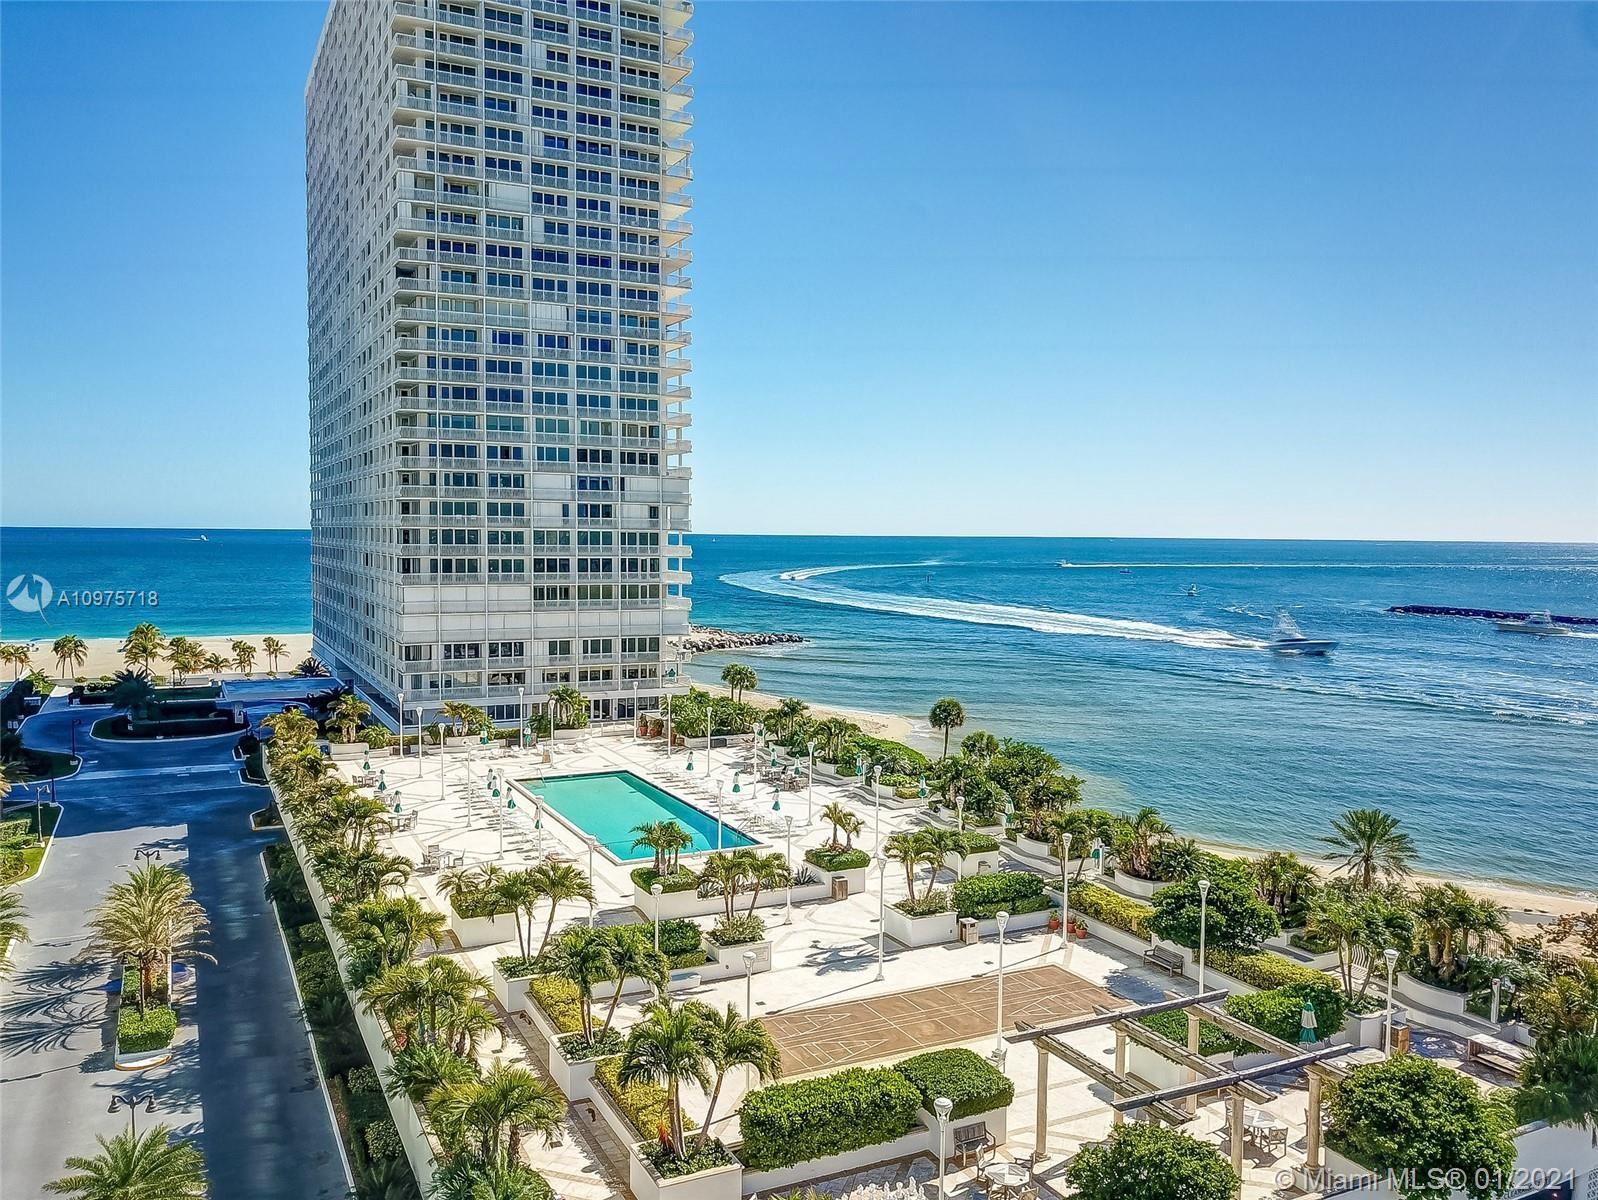 2200 S Ocean Ln #1008, Fort Lauderdale, FL 33316 - #: A10975718